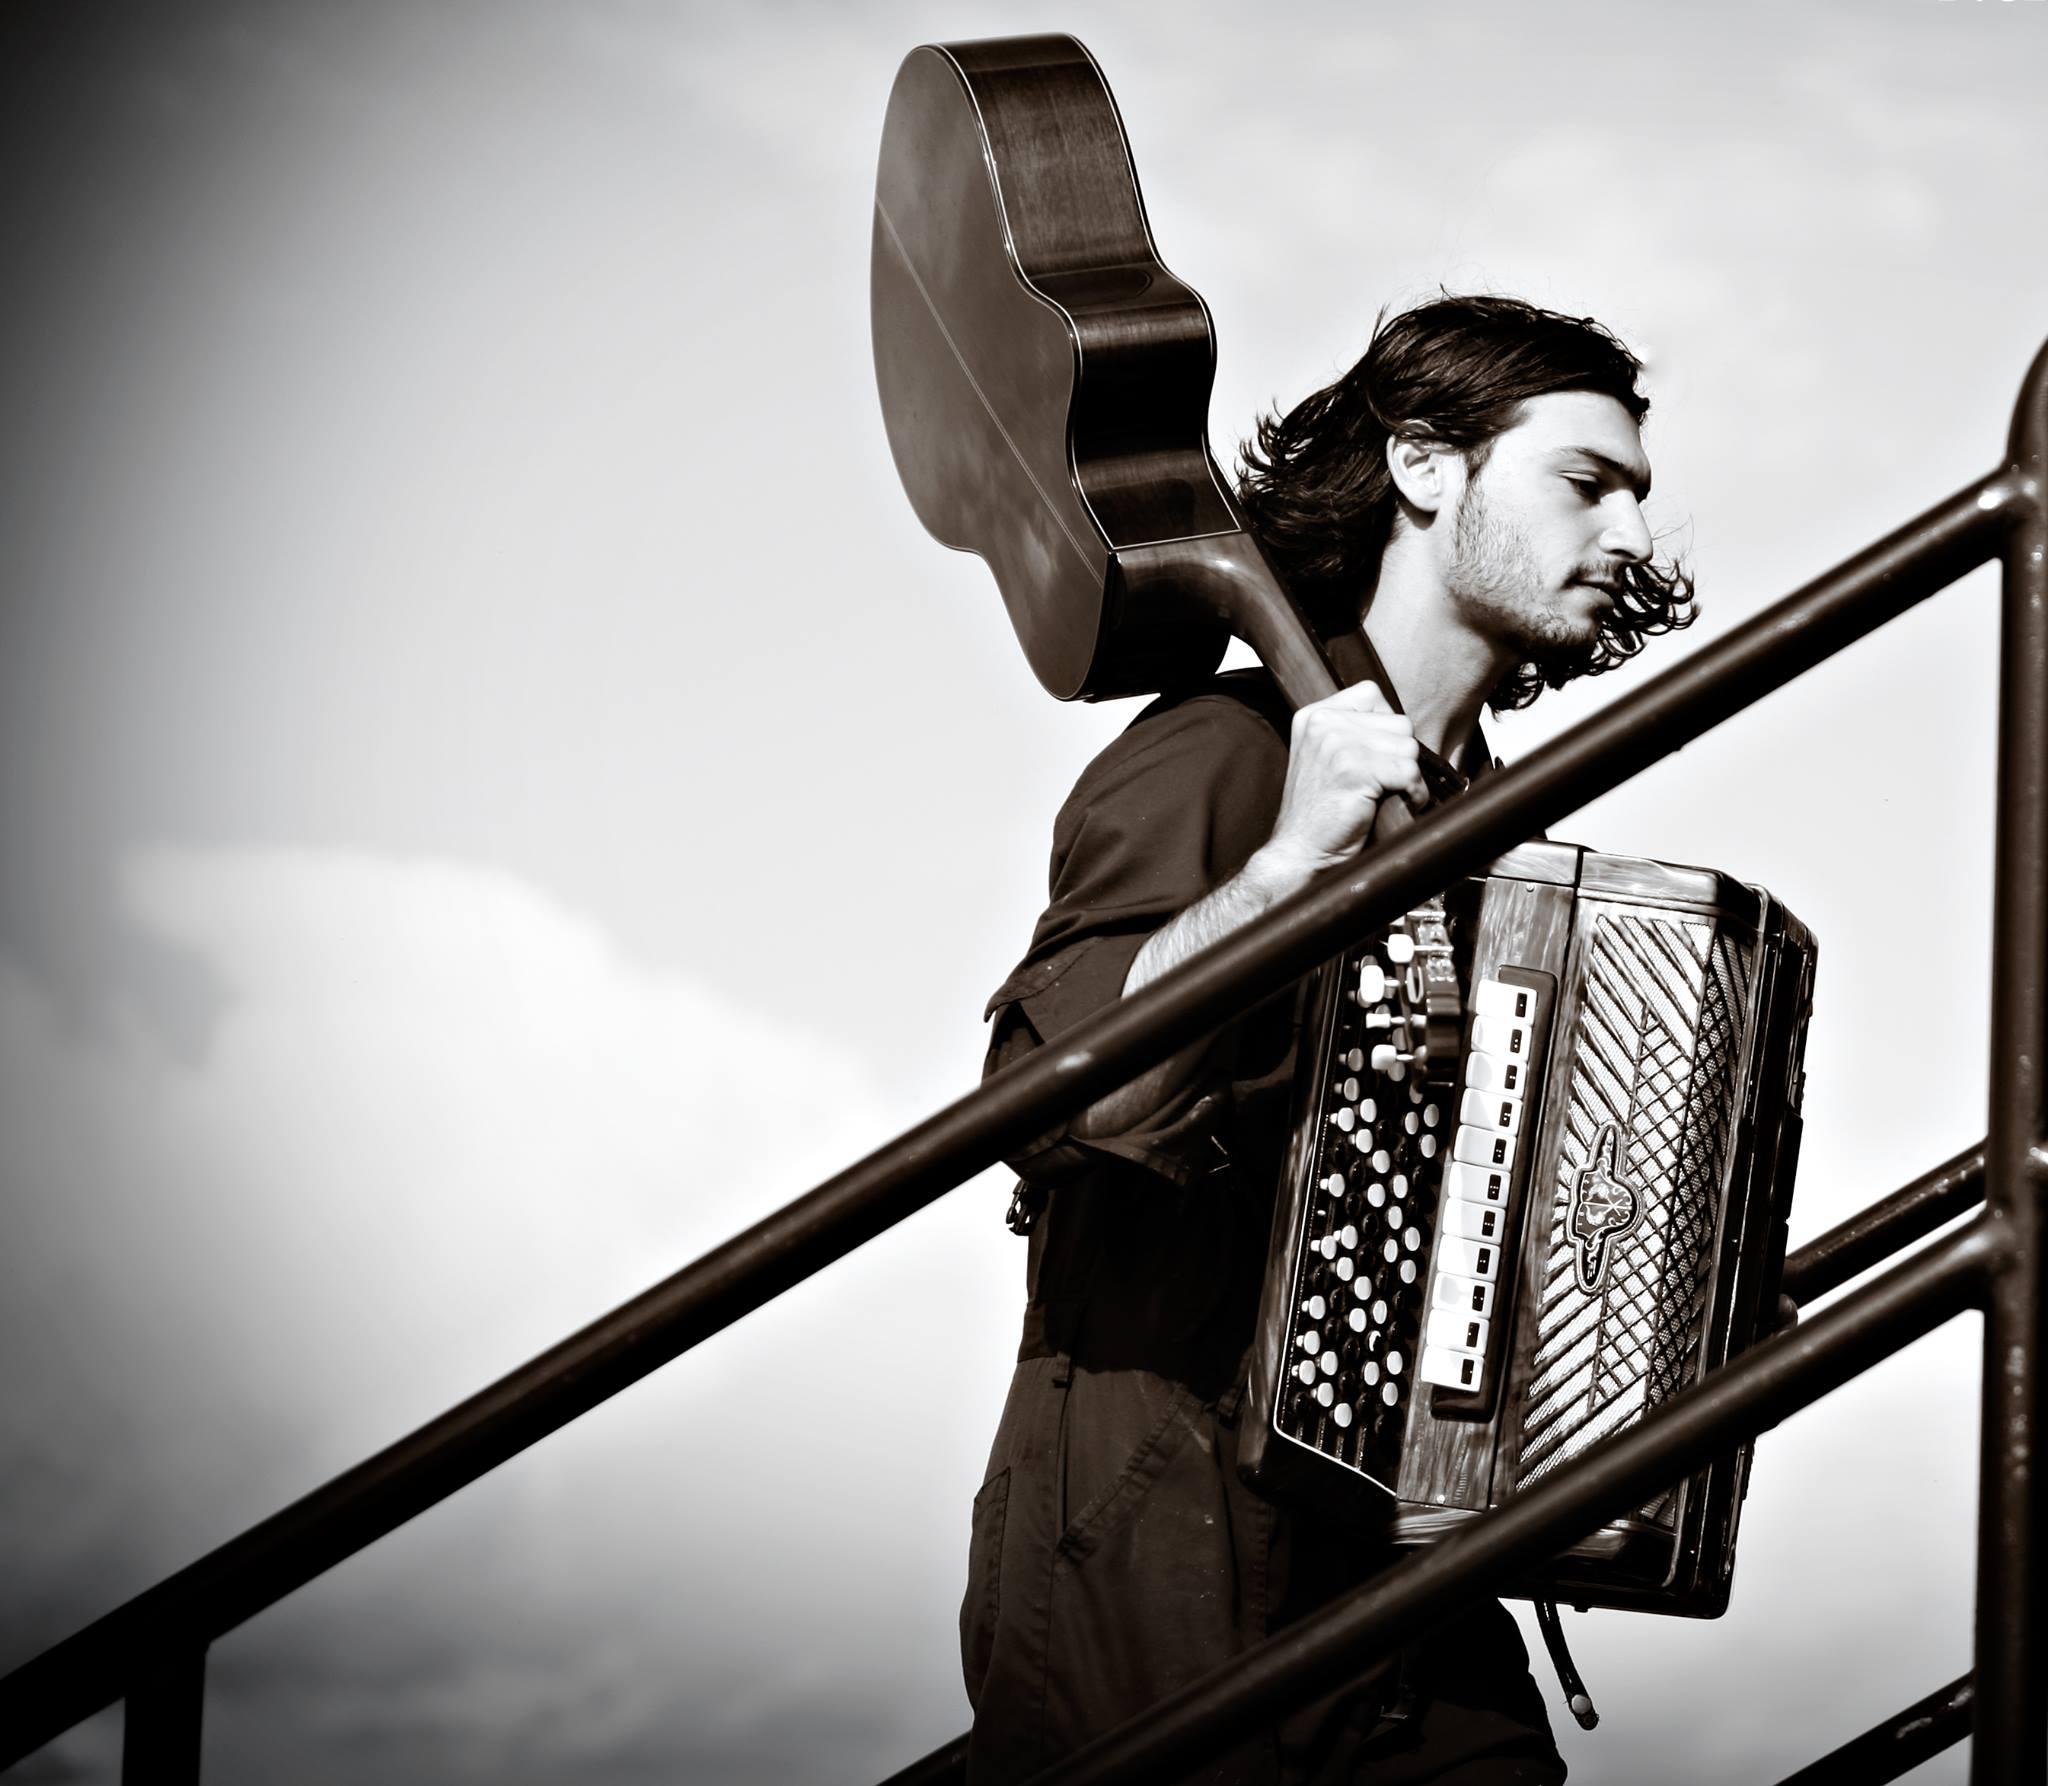 Paul Koslowski, JazzBuffalo